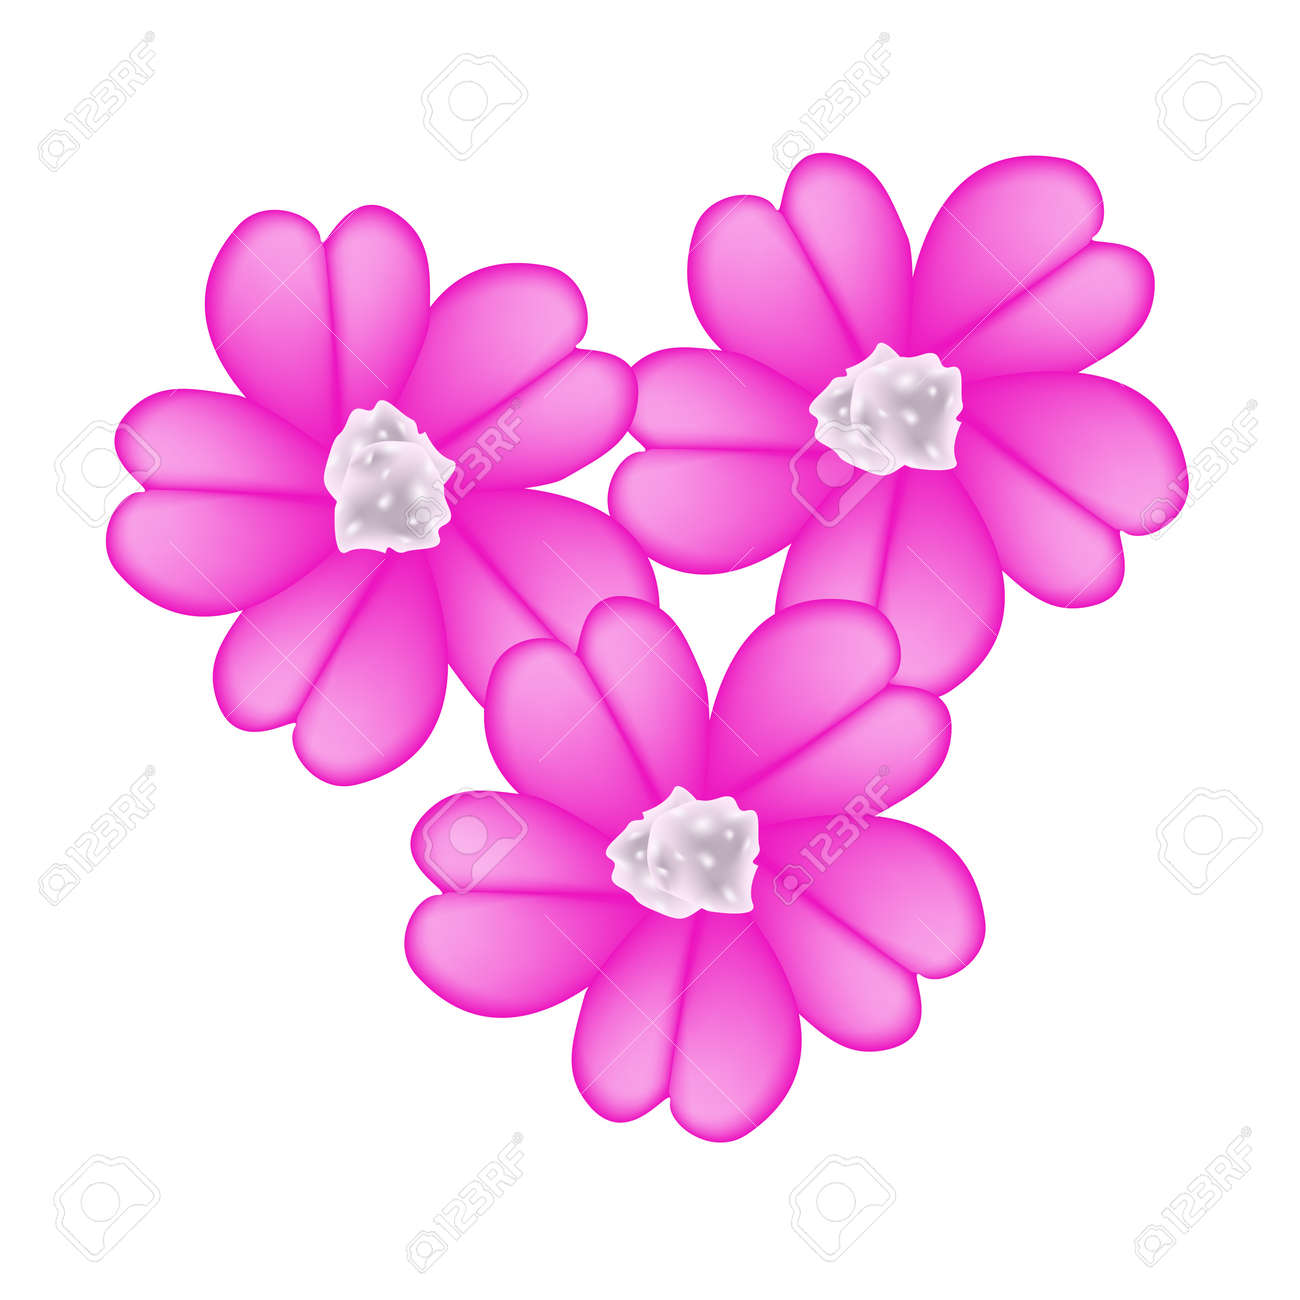 Beautiful flower illustration of pink yarrow flowers or achillea beautiful flower illustration of pink yarrow flowers or achillea millefolium flowers isolated on white background mightylinksfo